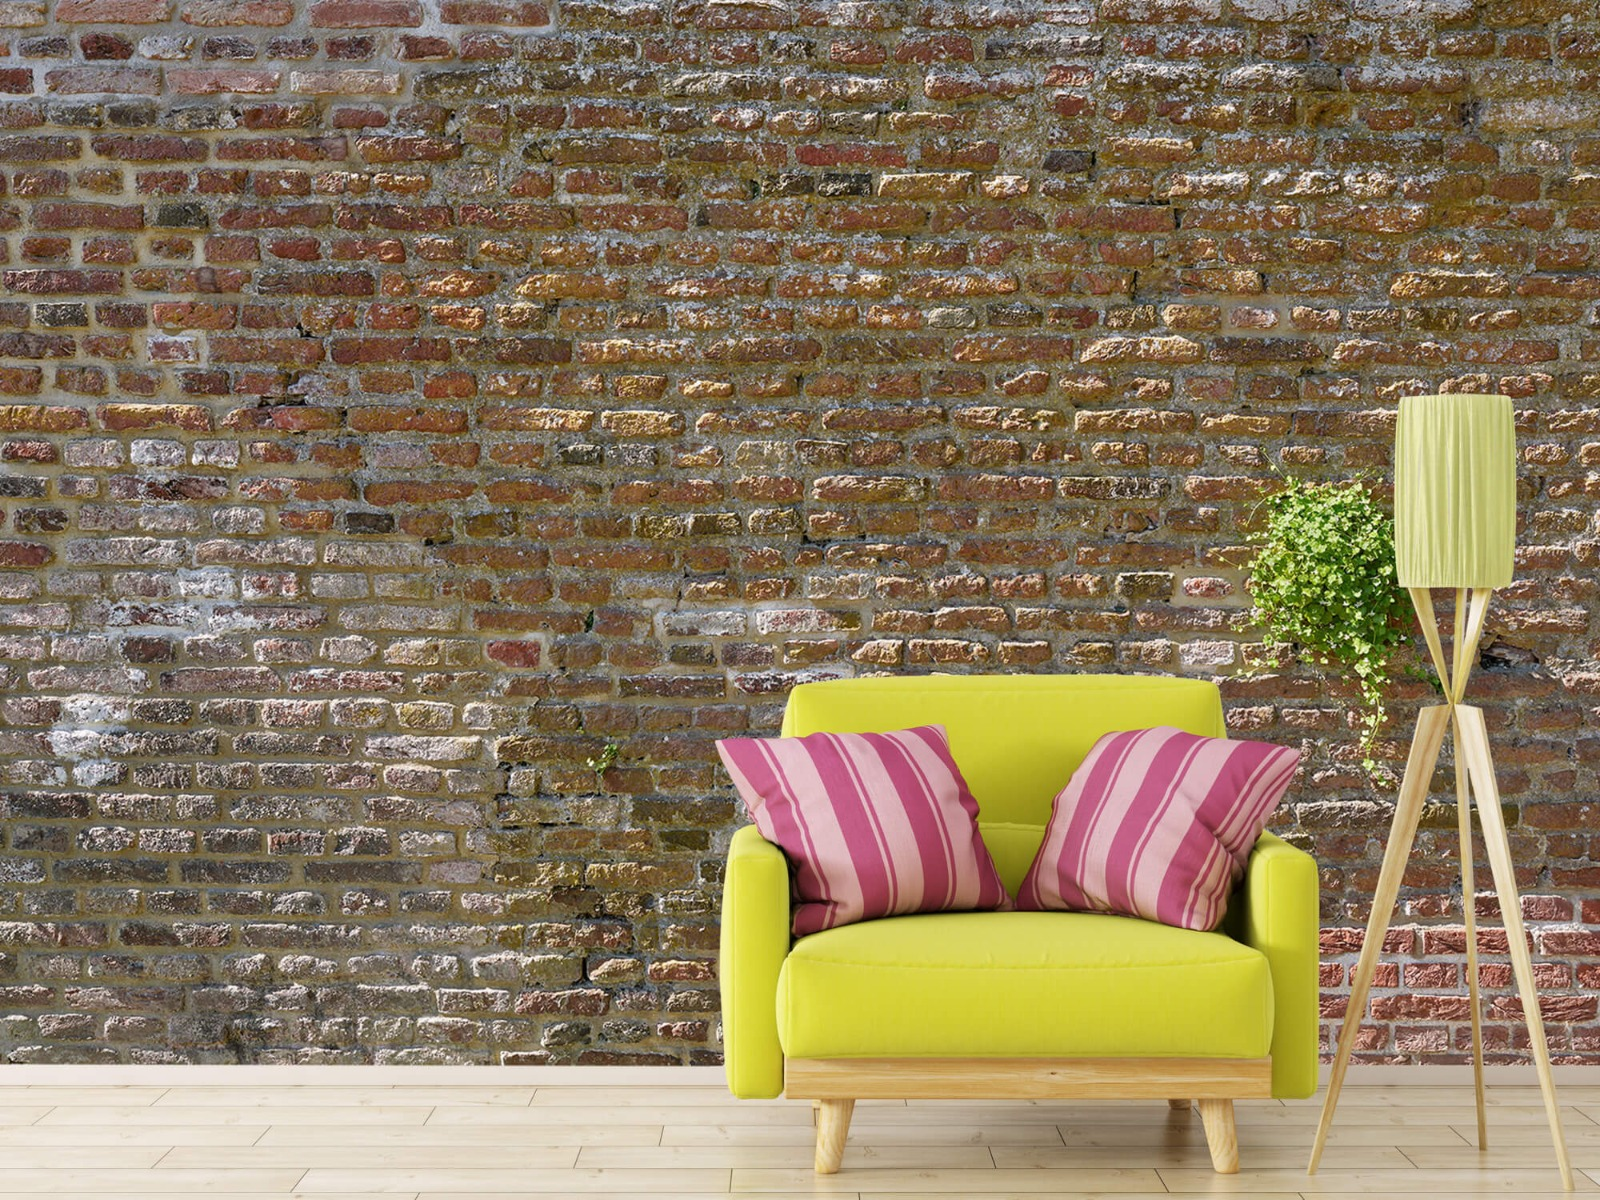 Stenen - Oude stenen stadsmuur met plantjes 17